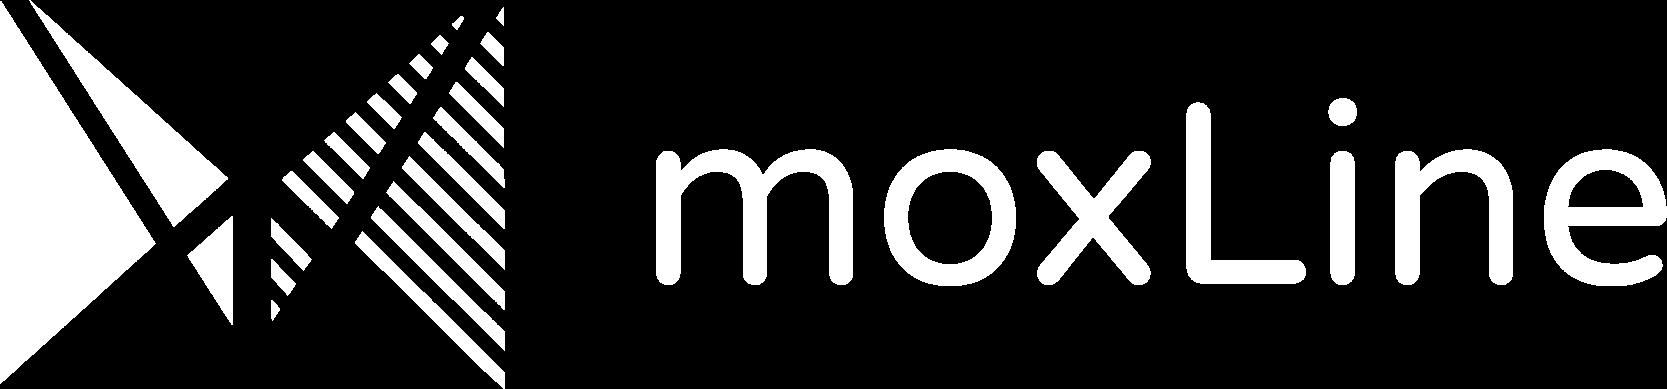 Moxline solutions logo